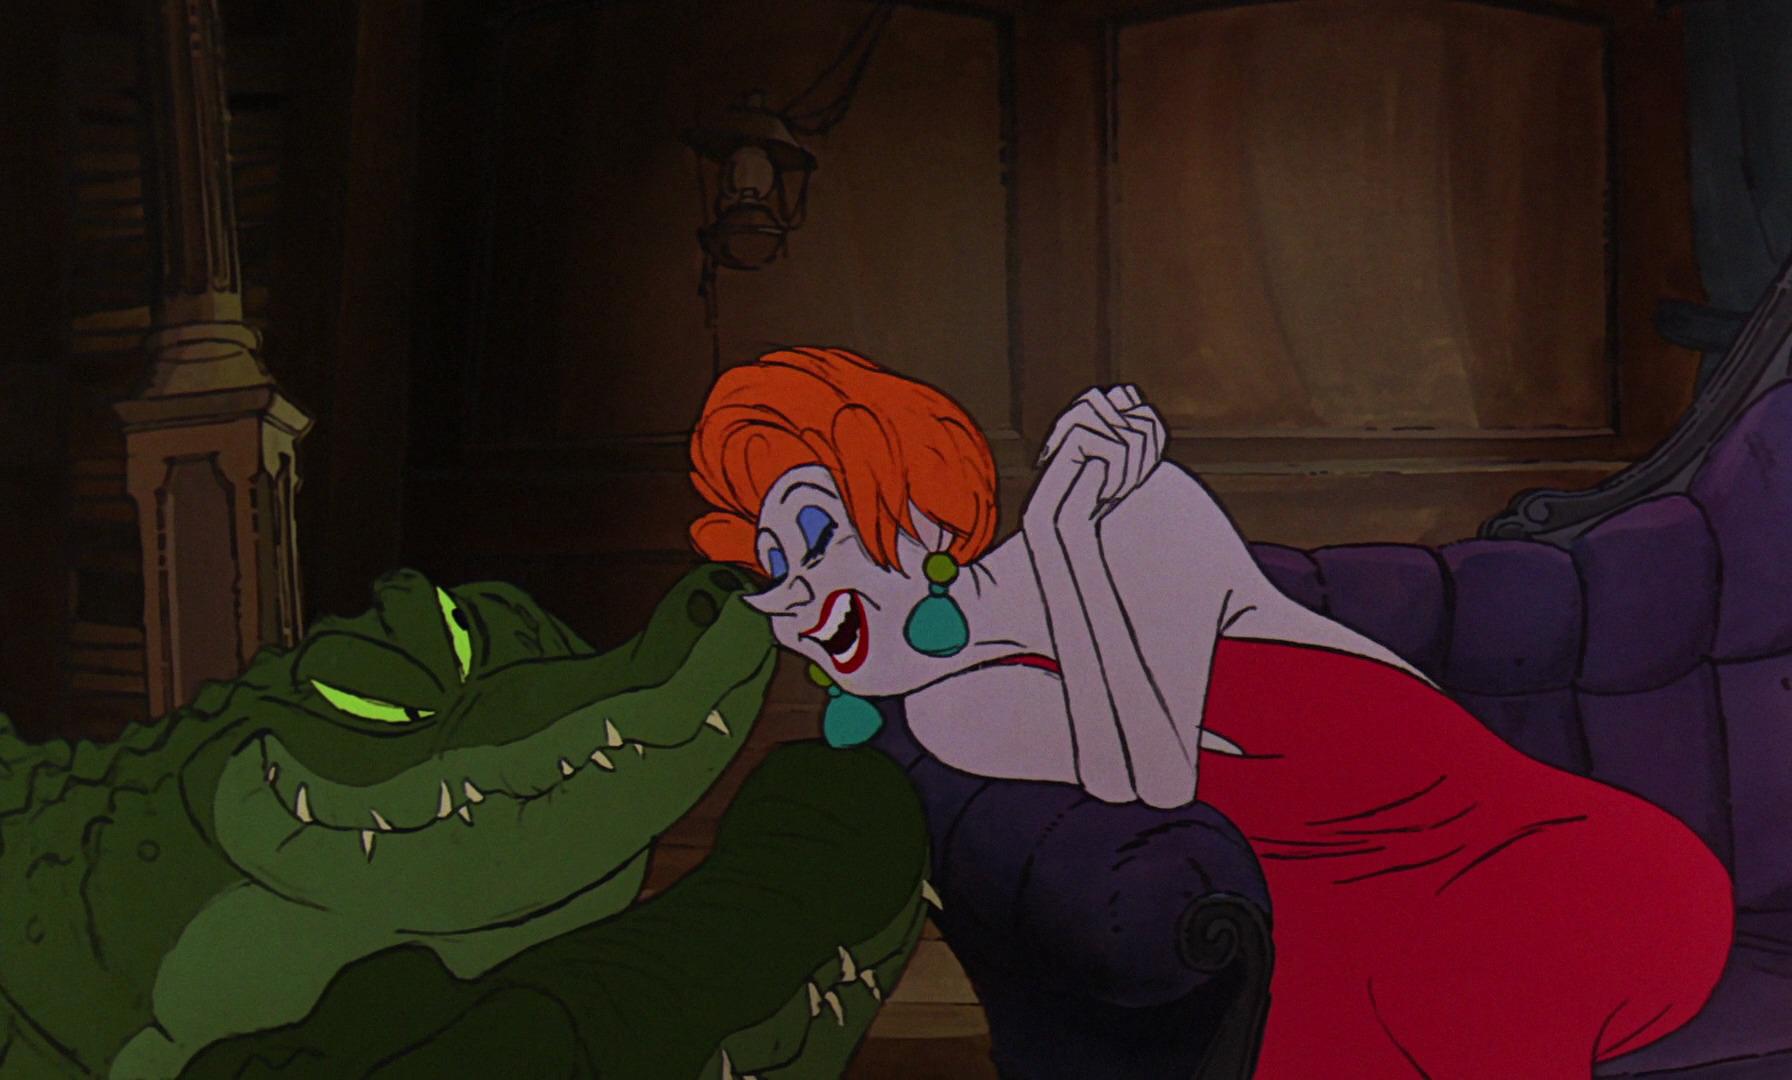 L SflYdisney-the-rescuers-villain-madame-medusa-mr-snoops-dat